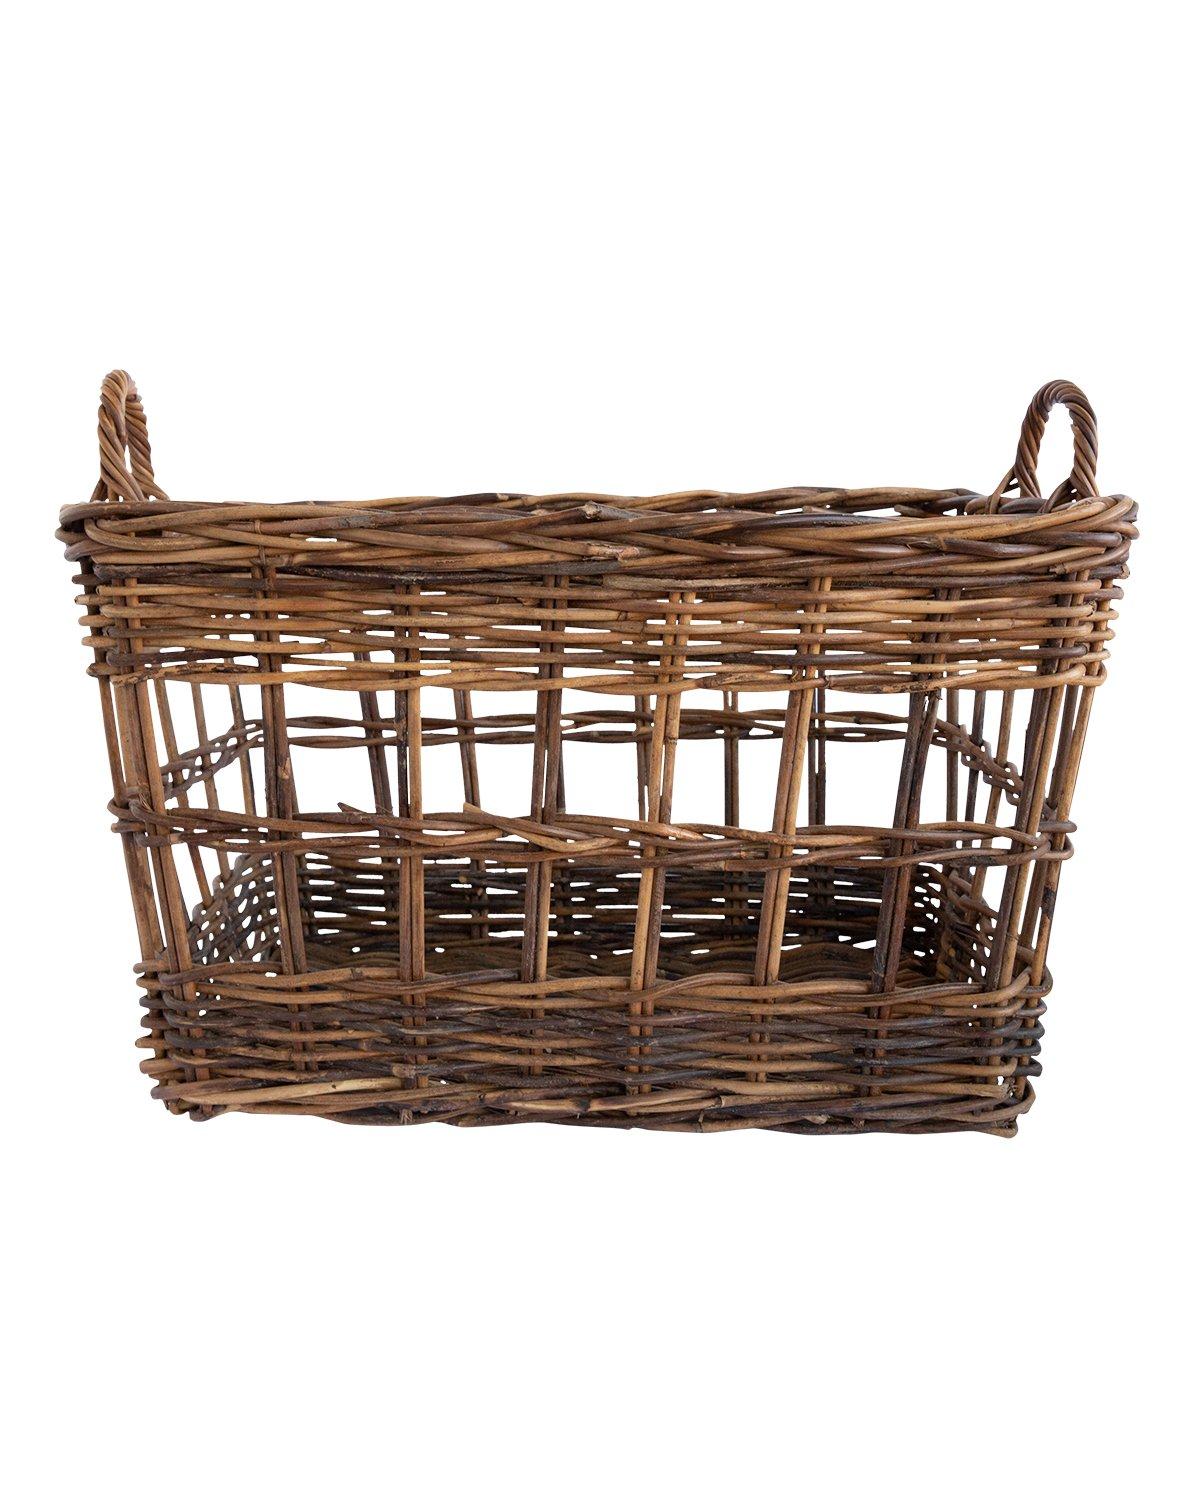 Rectangle_Produce_Baskets_4.jpg